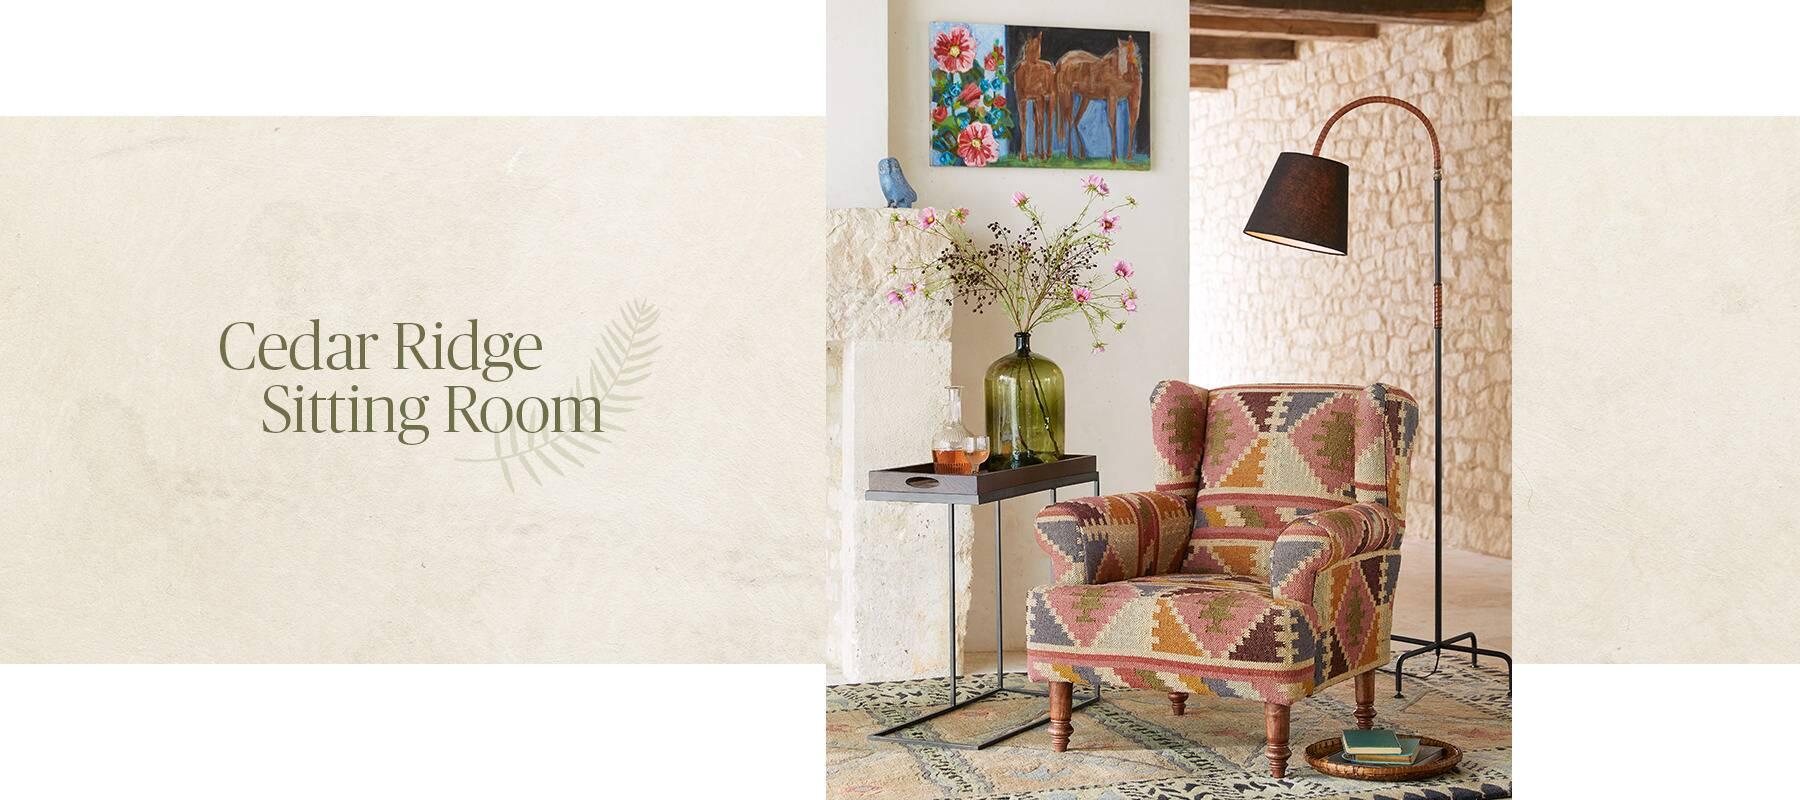 Cedar Ridge Sitting Room